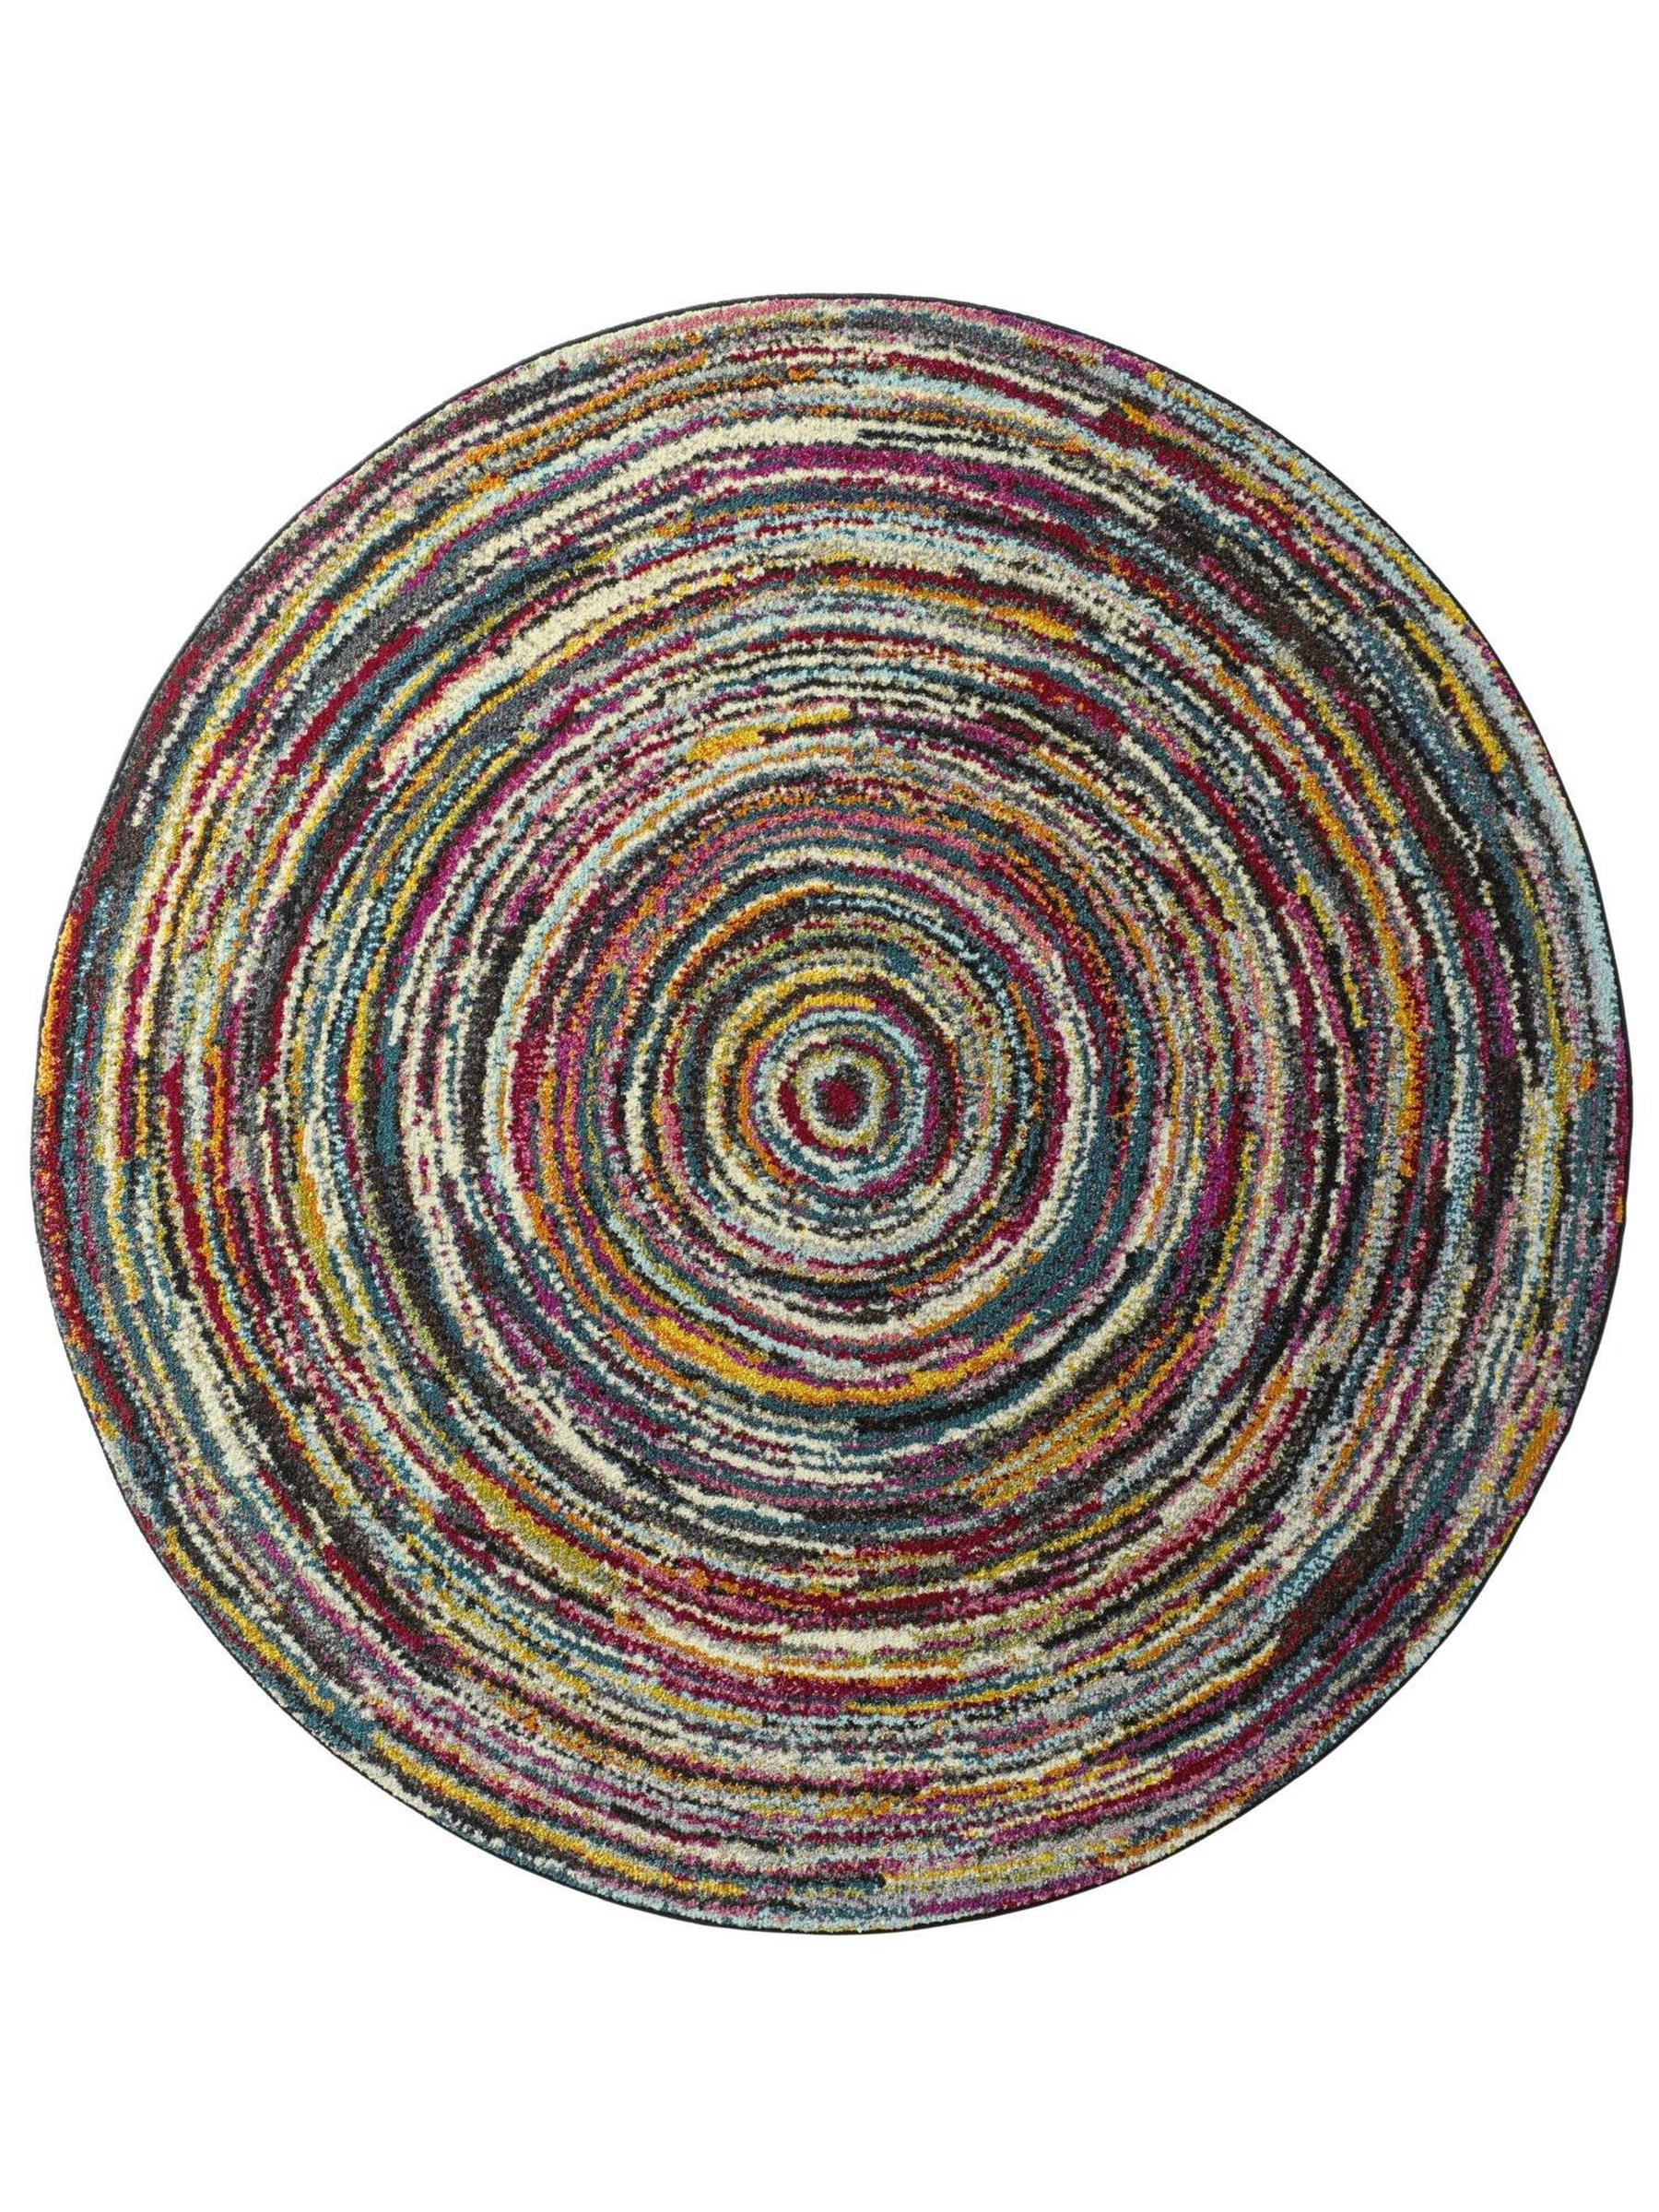 Teppich Ø160 farbenfrohes Dessin